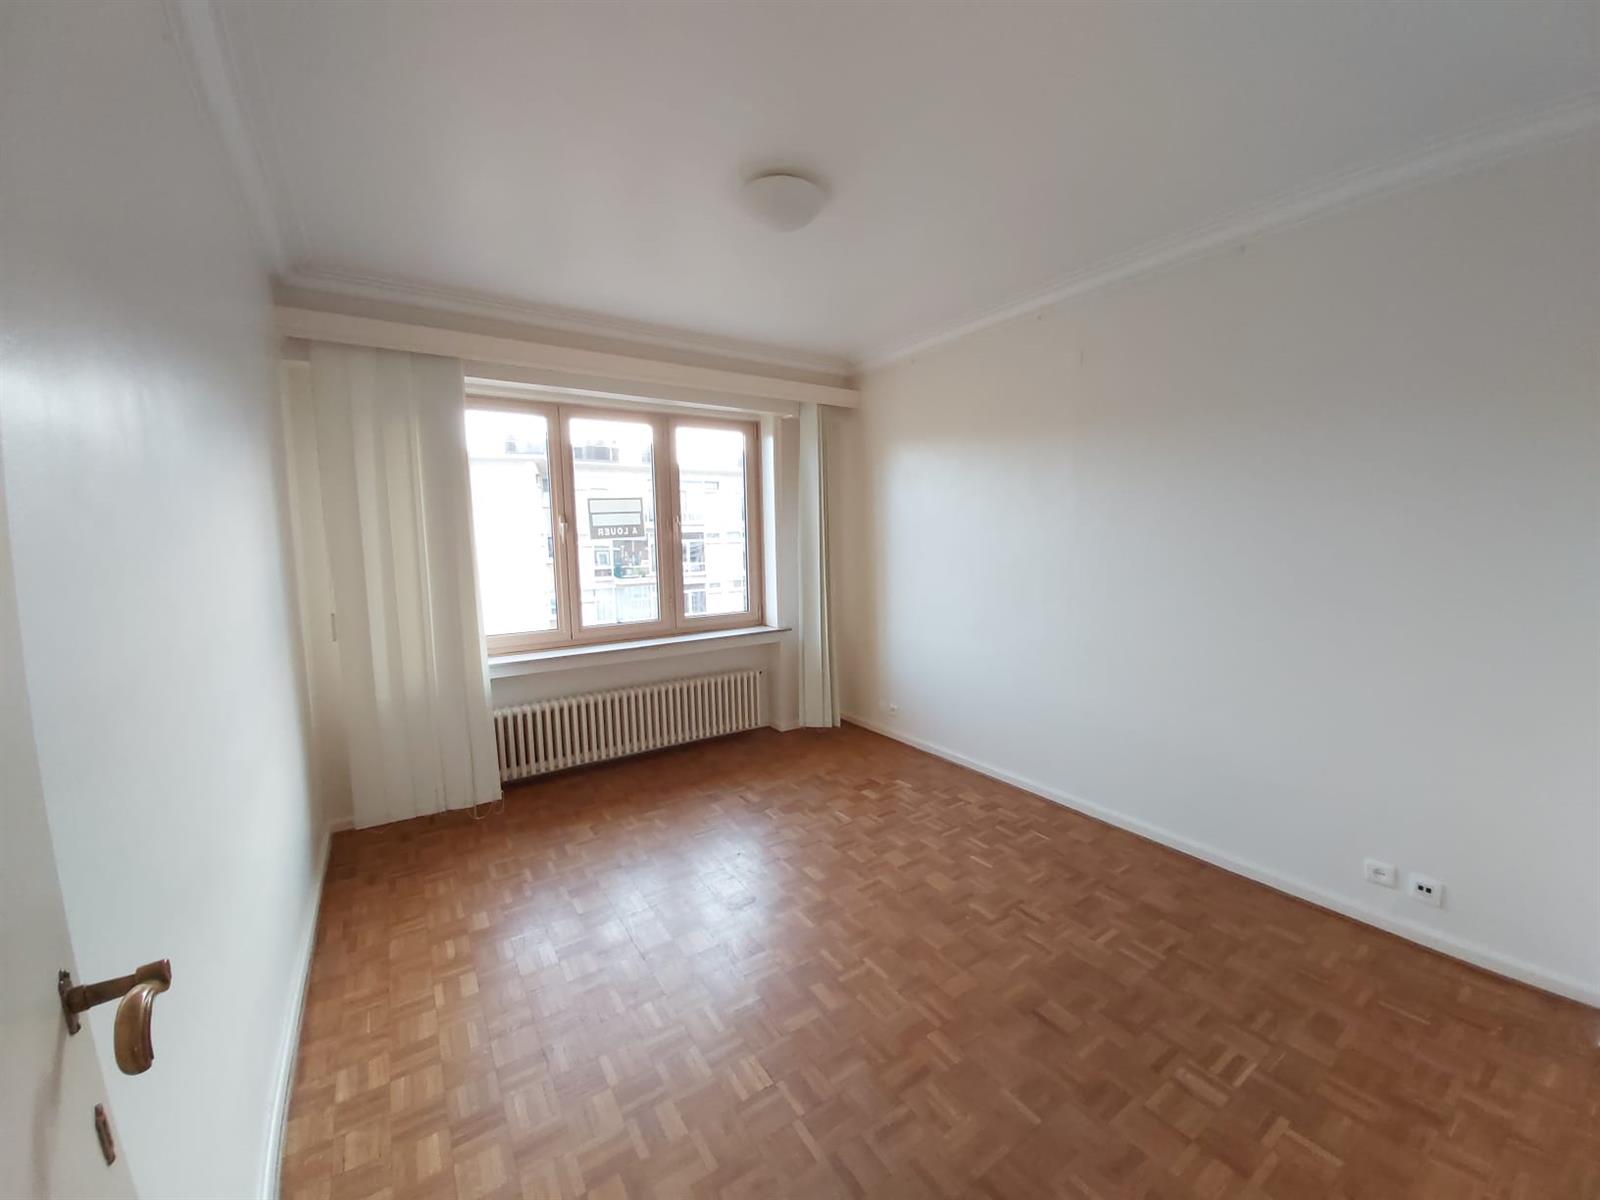 Appartement - Woluwe-Saint-Lambert - #4174735-6